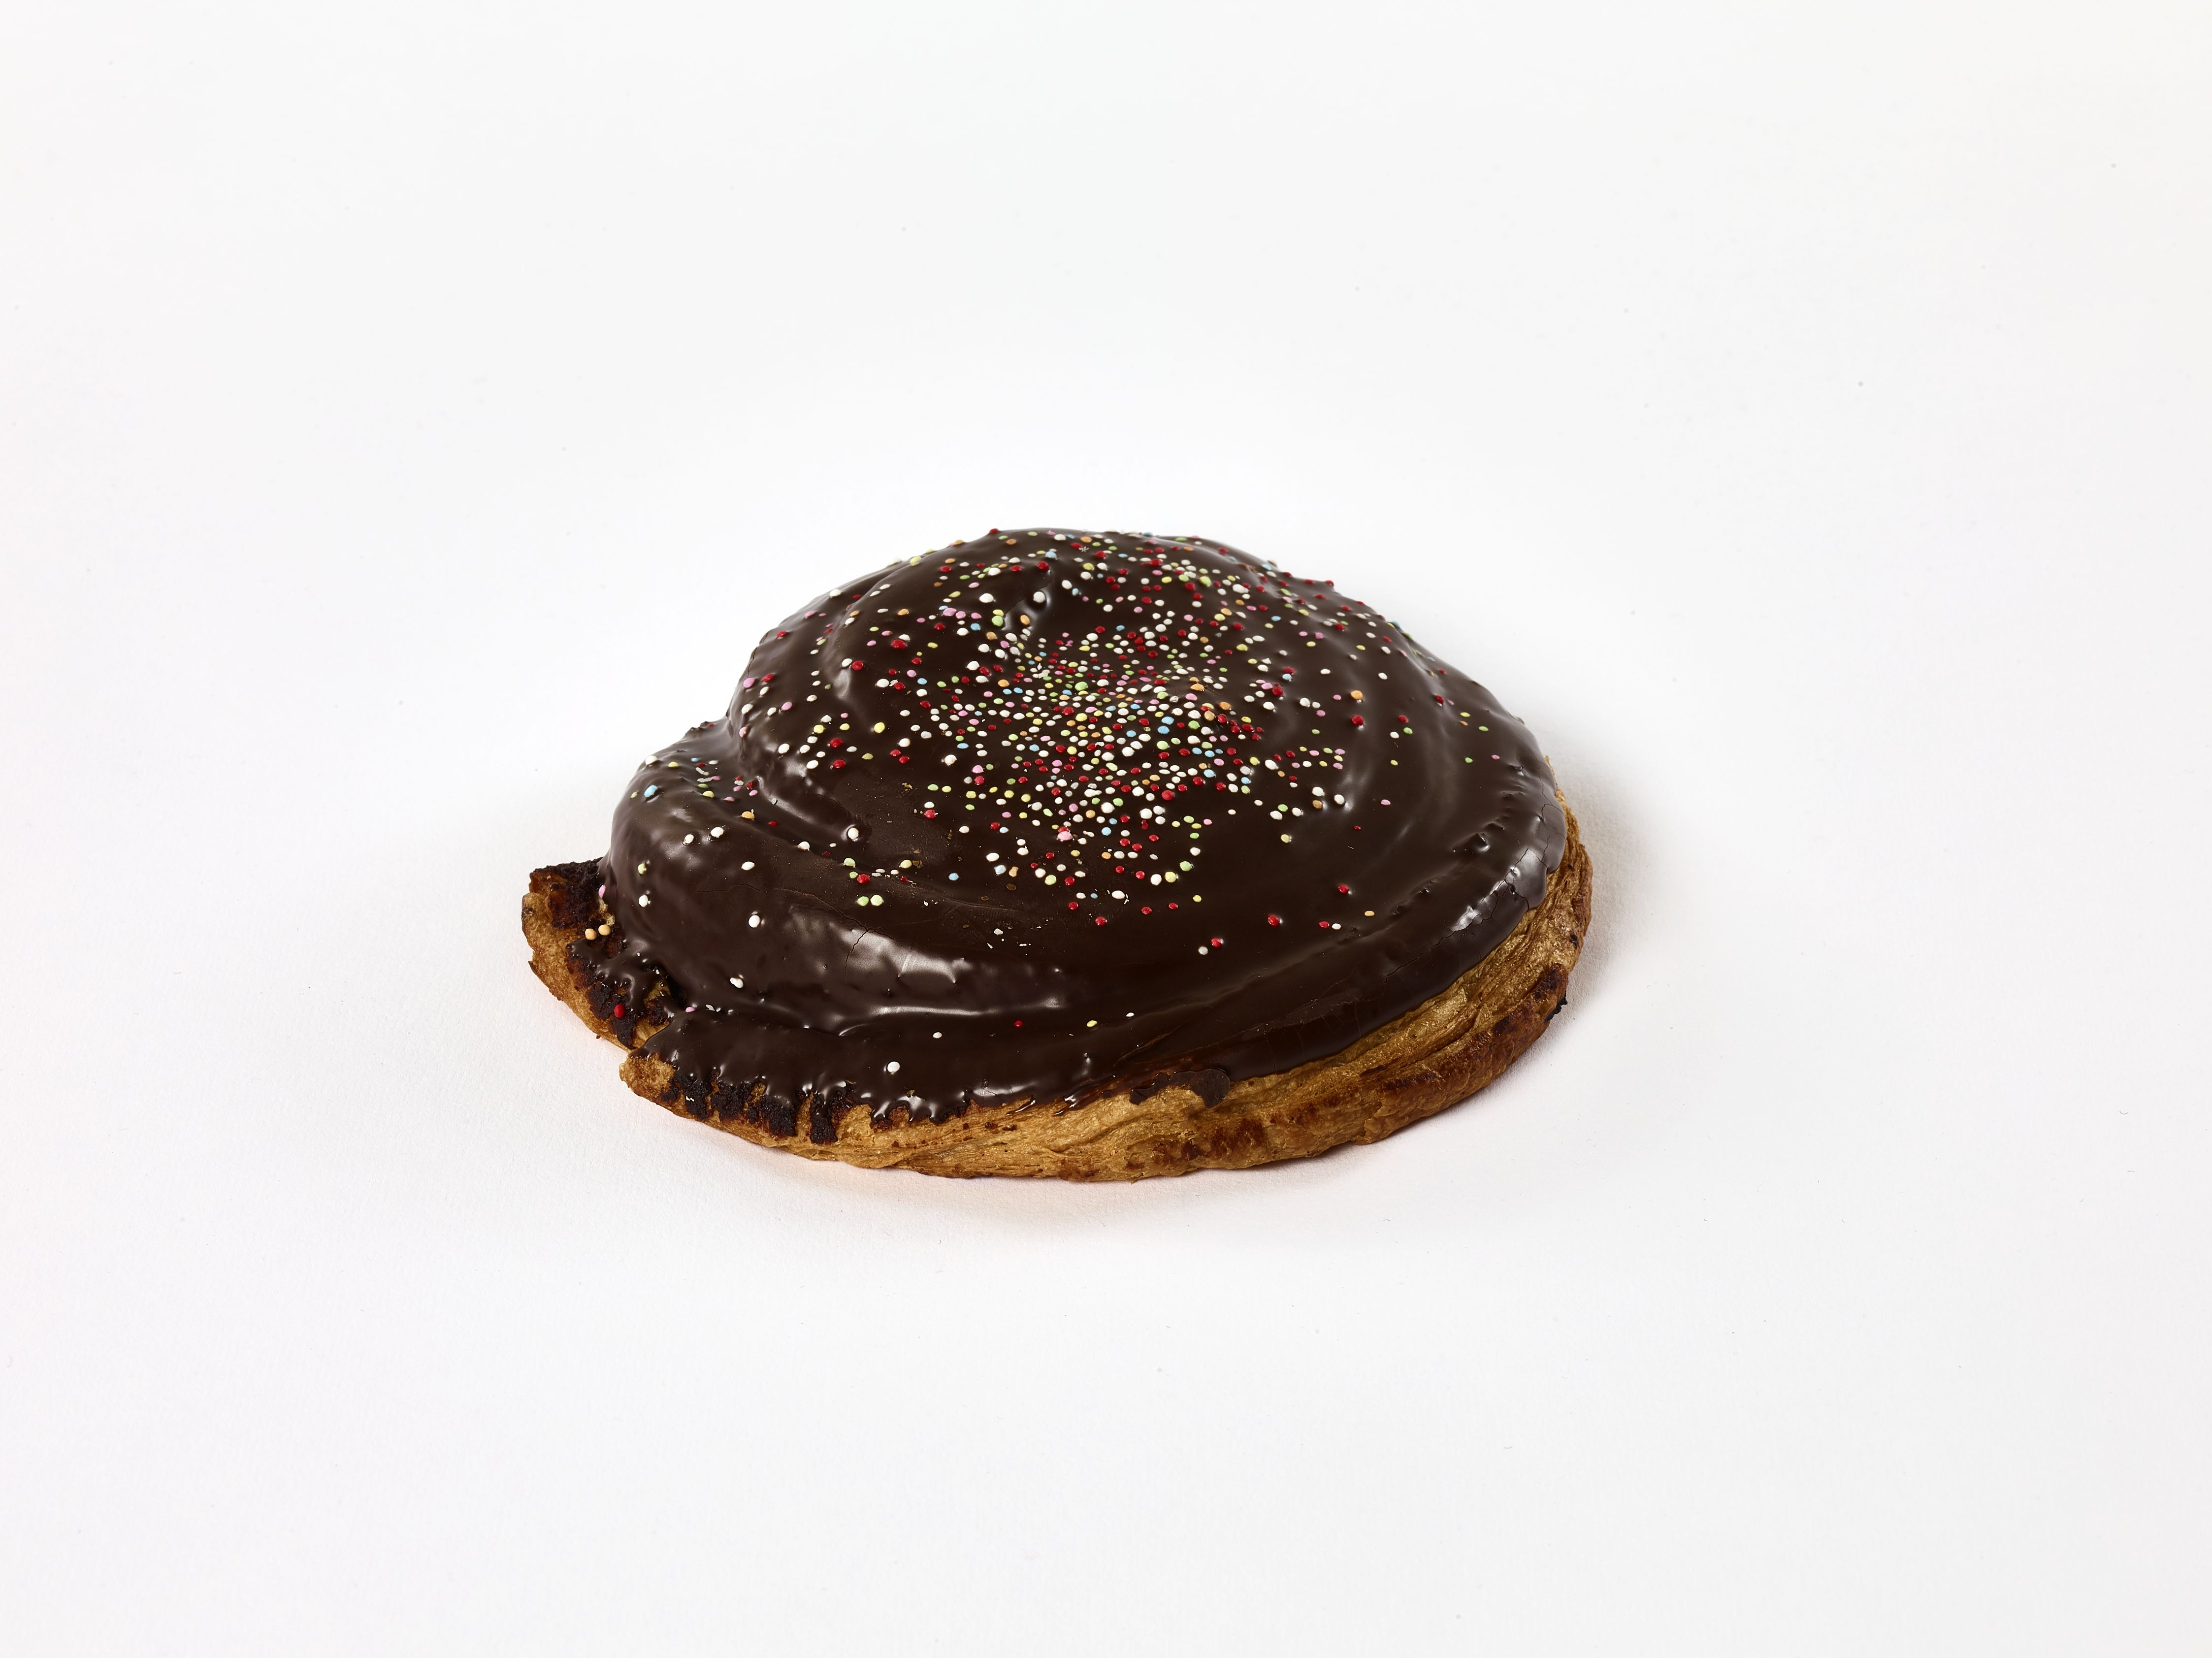 Csokis csiga